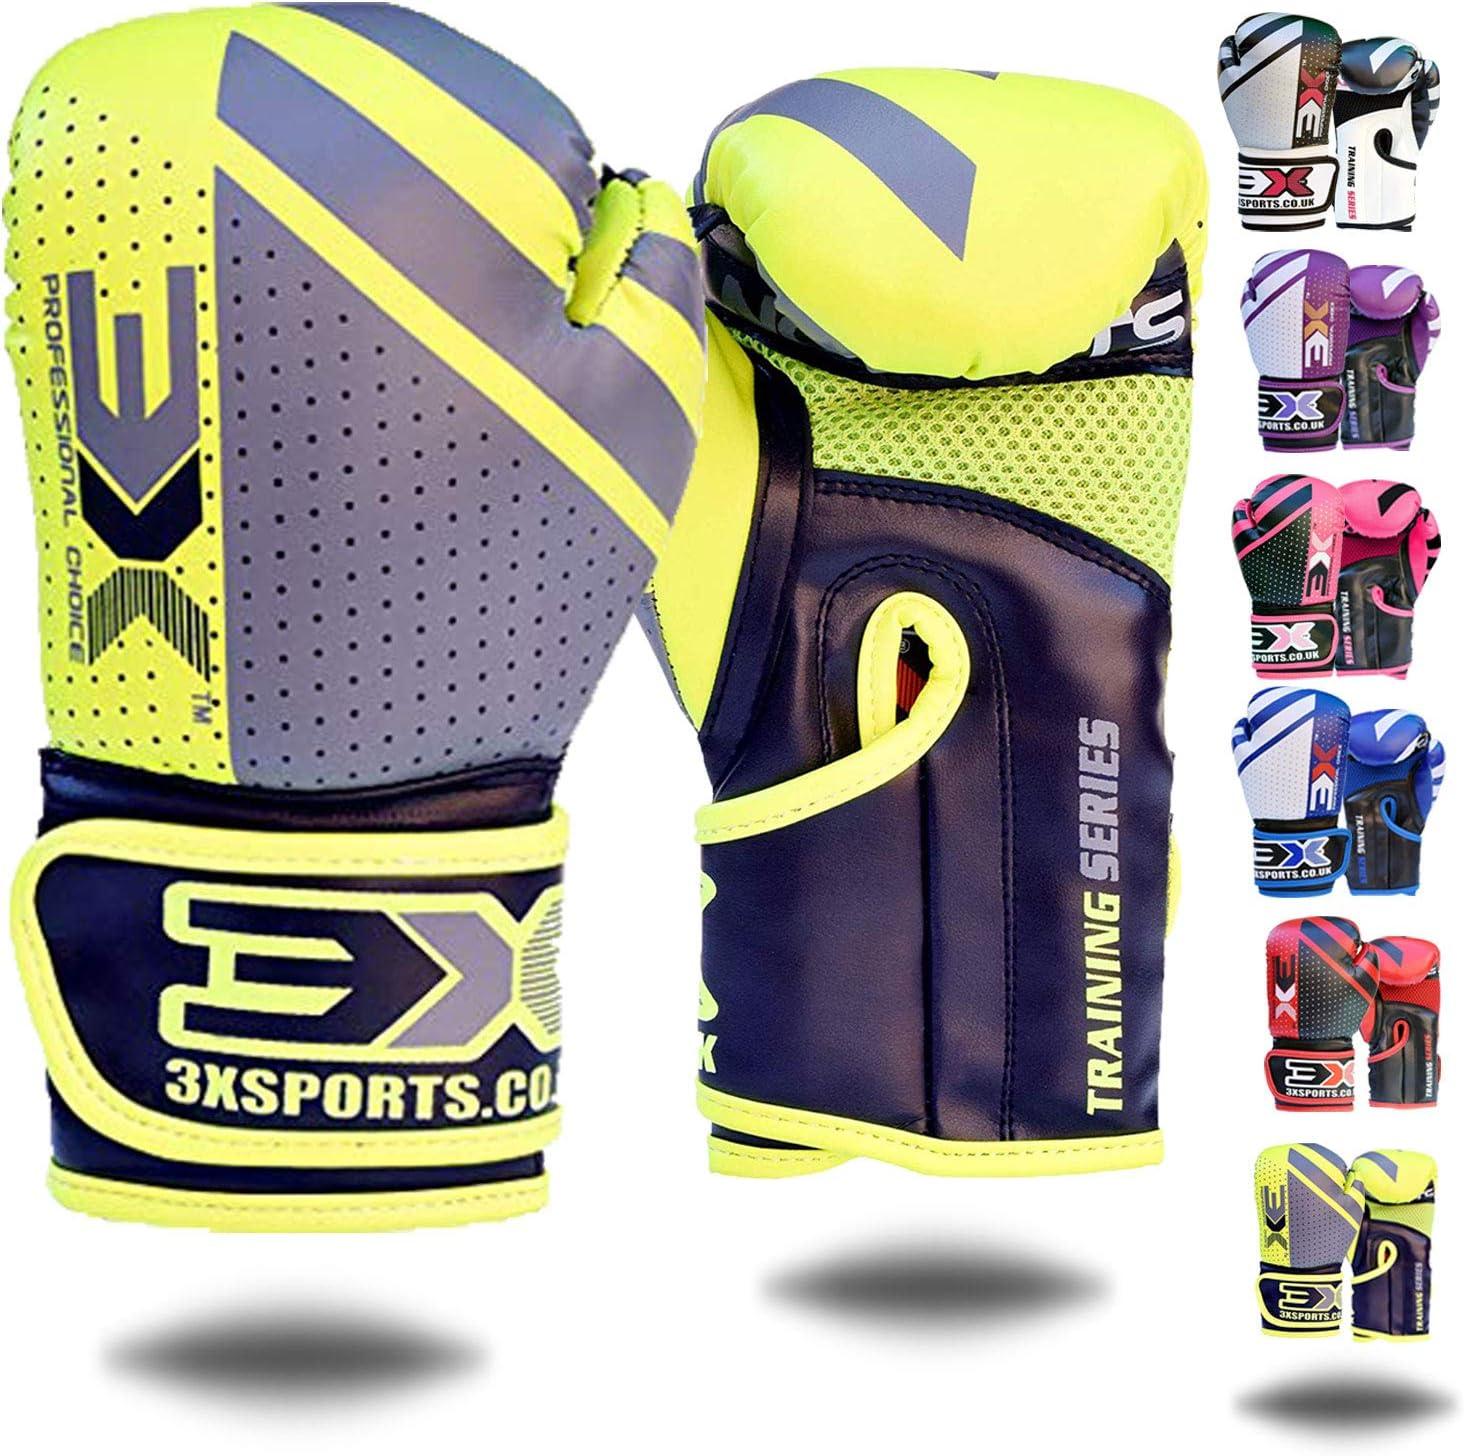 3X Professional Choice Gants de Boxe Kickboxing Muay Thai Gant Sac Frappe Sparring Entrainement Cuir Mitaines Competition Boxing Gloves Garcons Filles